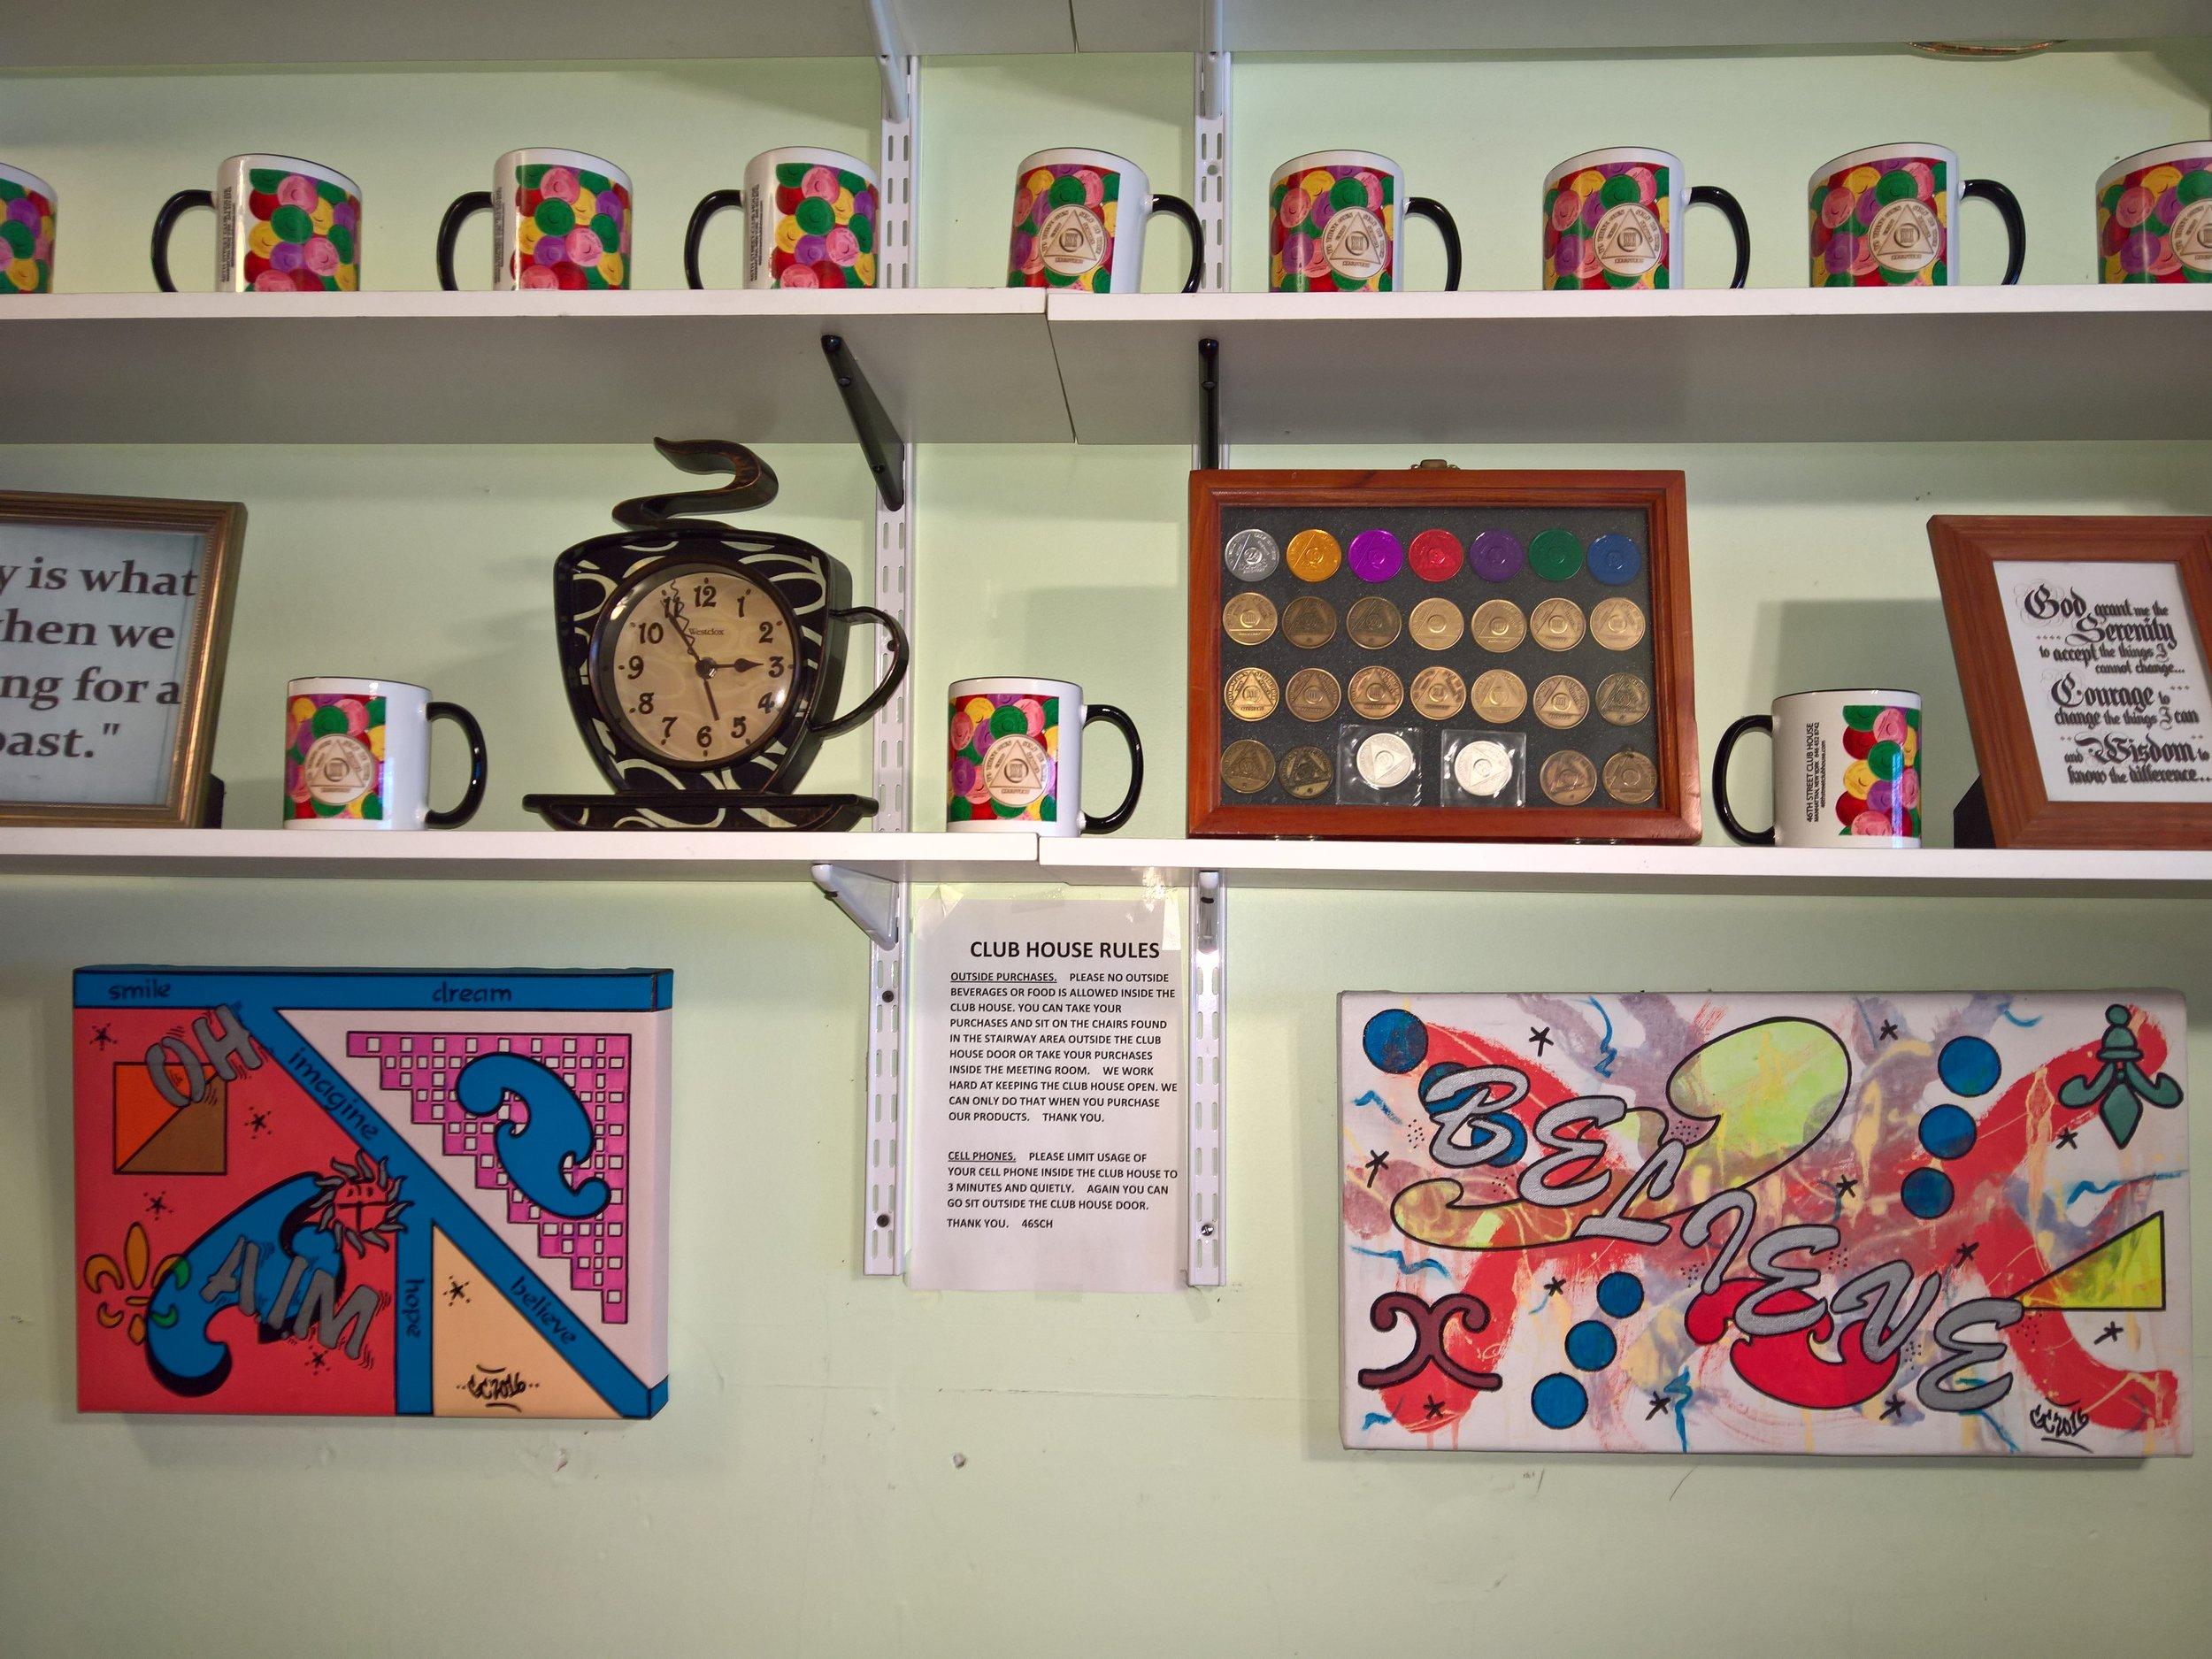 46th_street_clubhouse_wall_of_art_mugs.jpg